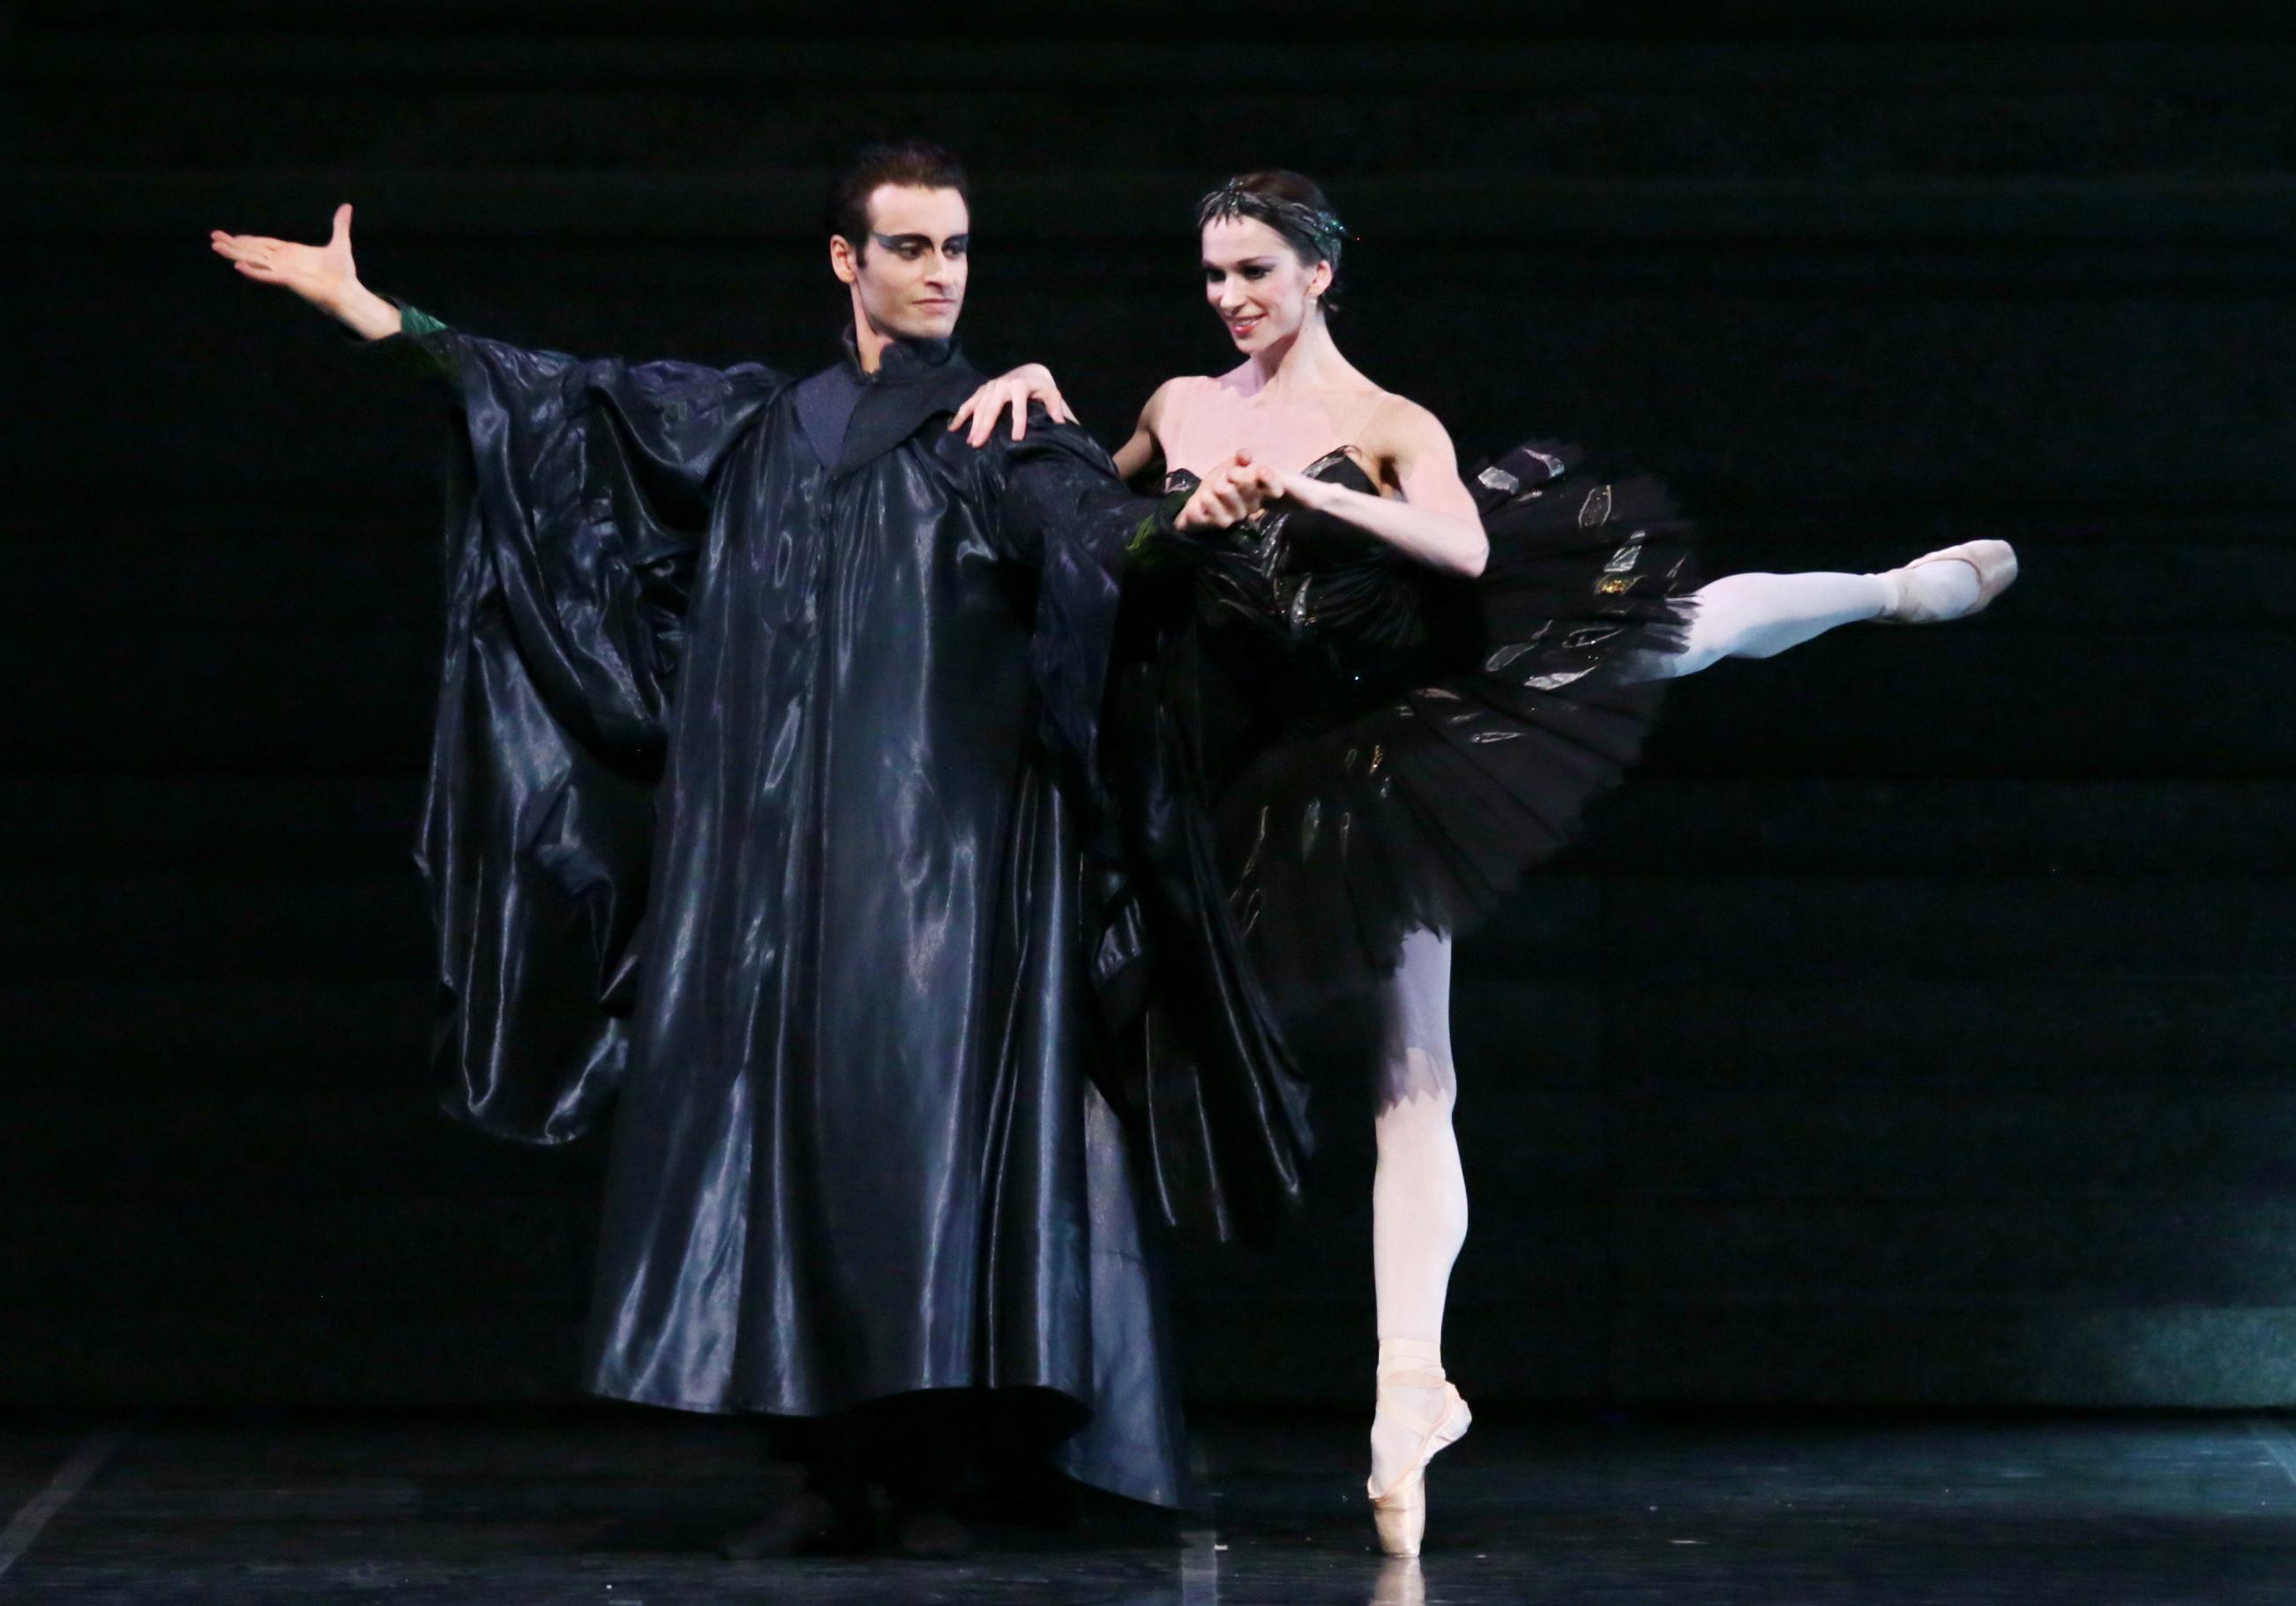 Marco Agostino and Polina Semionova